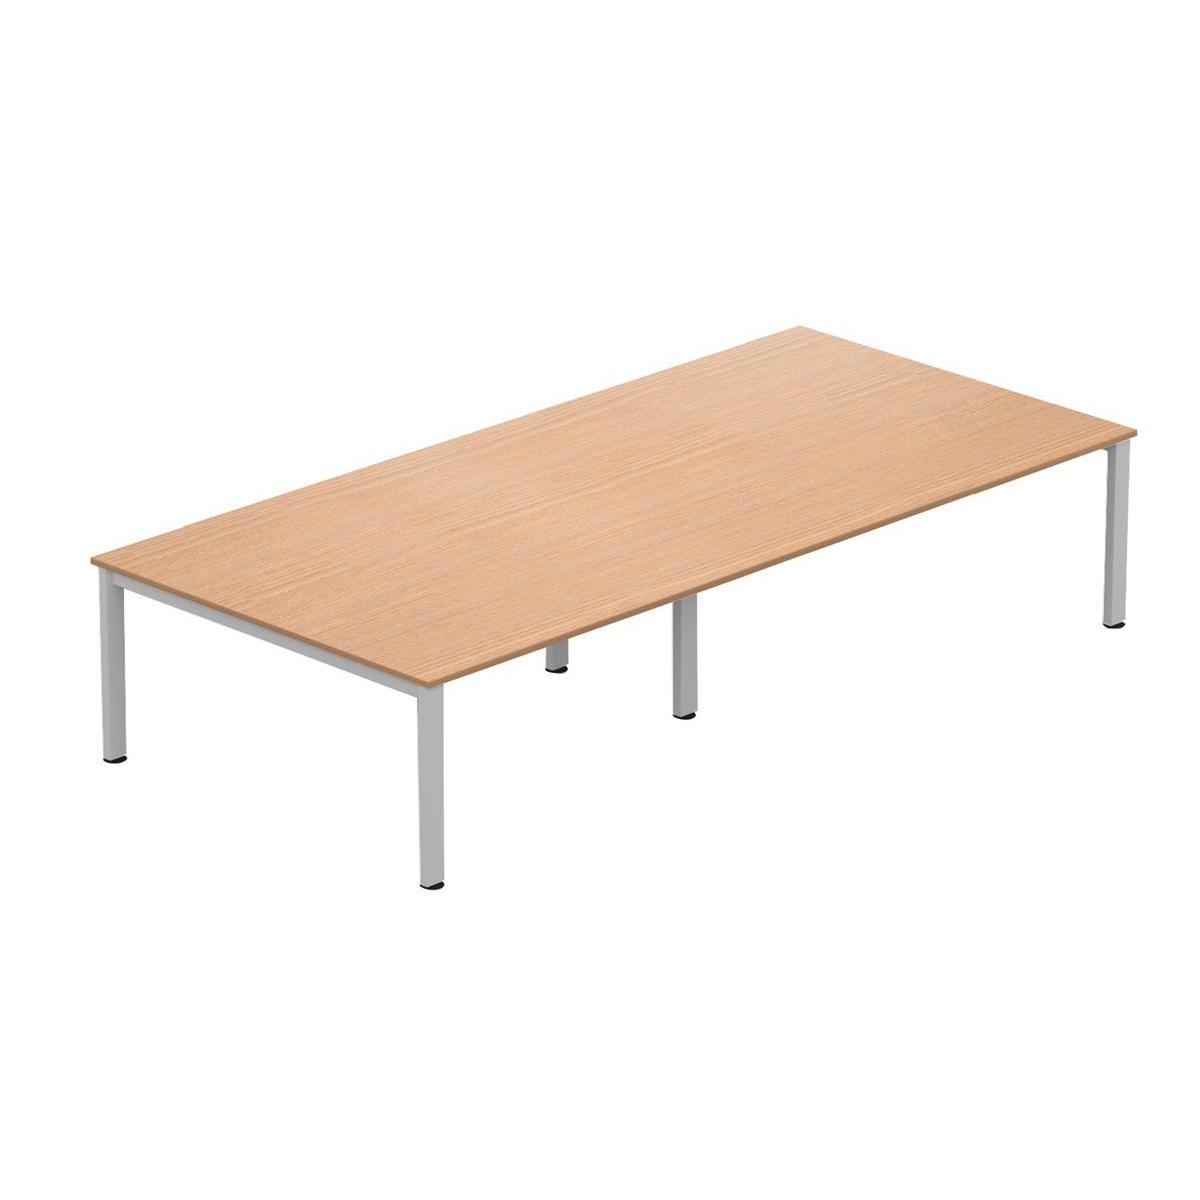 Tables Sonix Meeting Table Silver Legs 3600x1600mm Beech Ref fb3616mtb